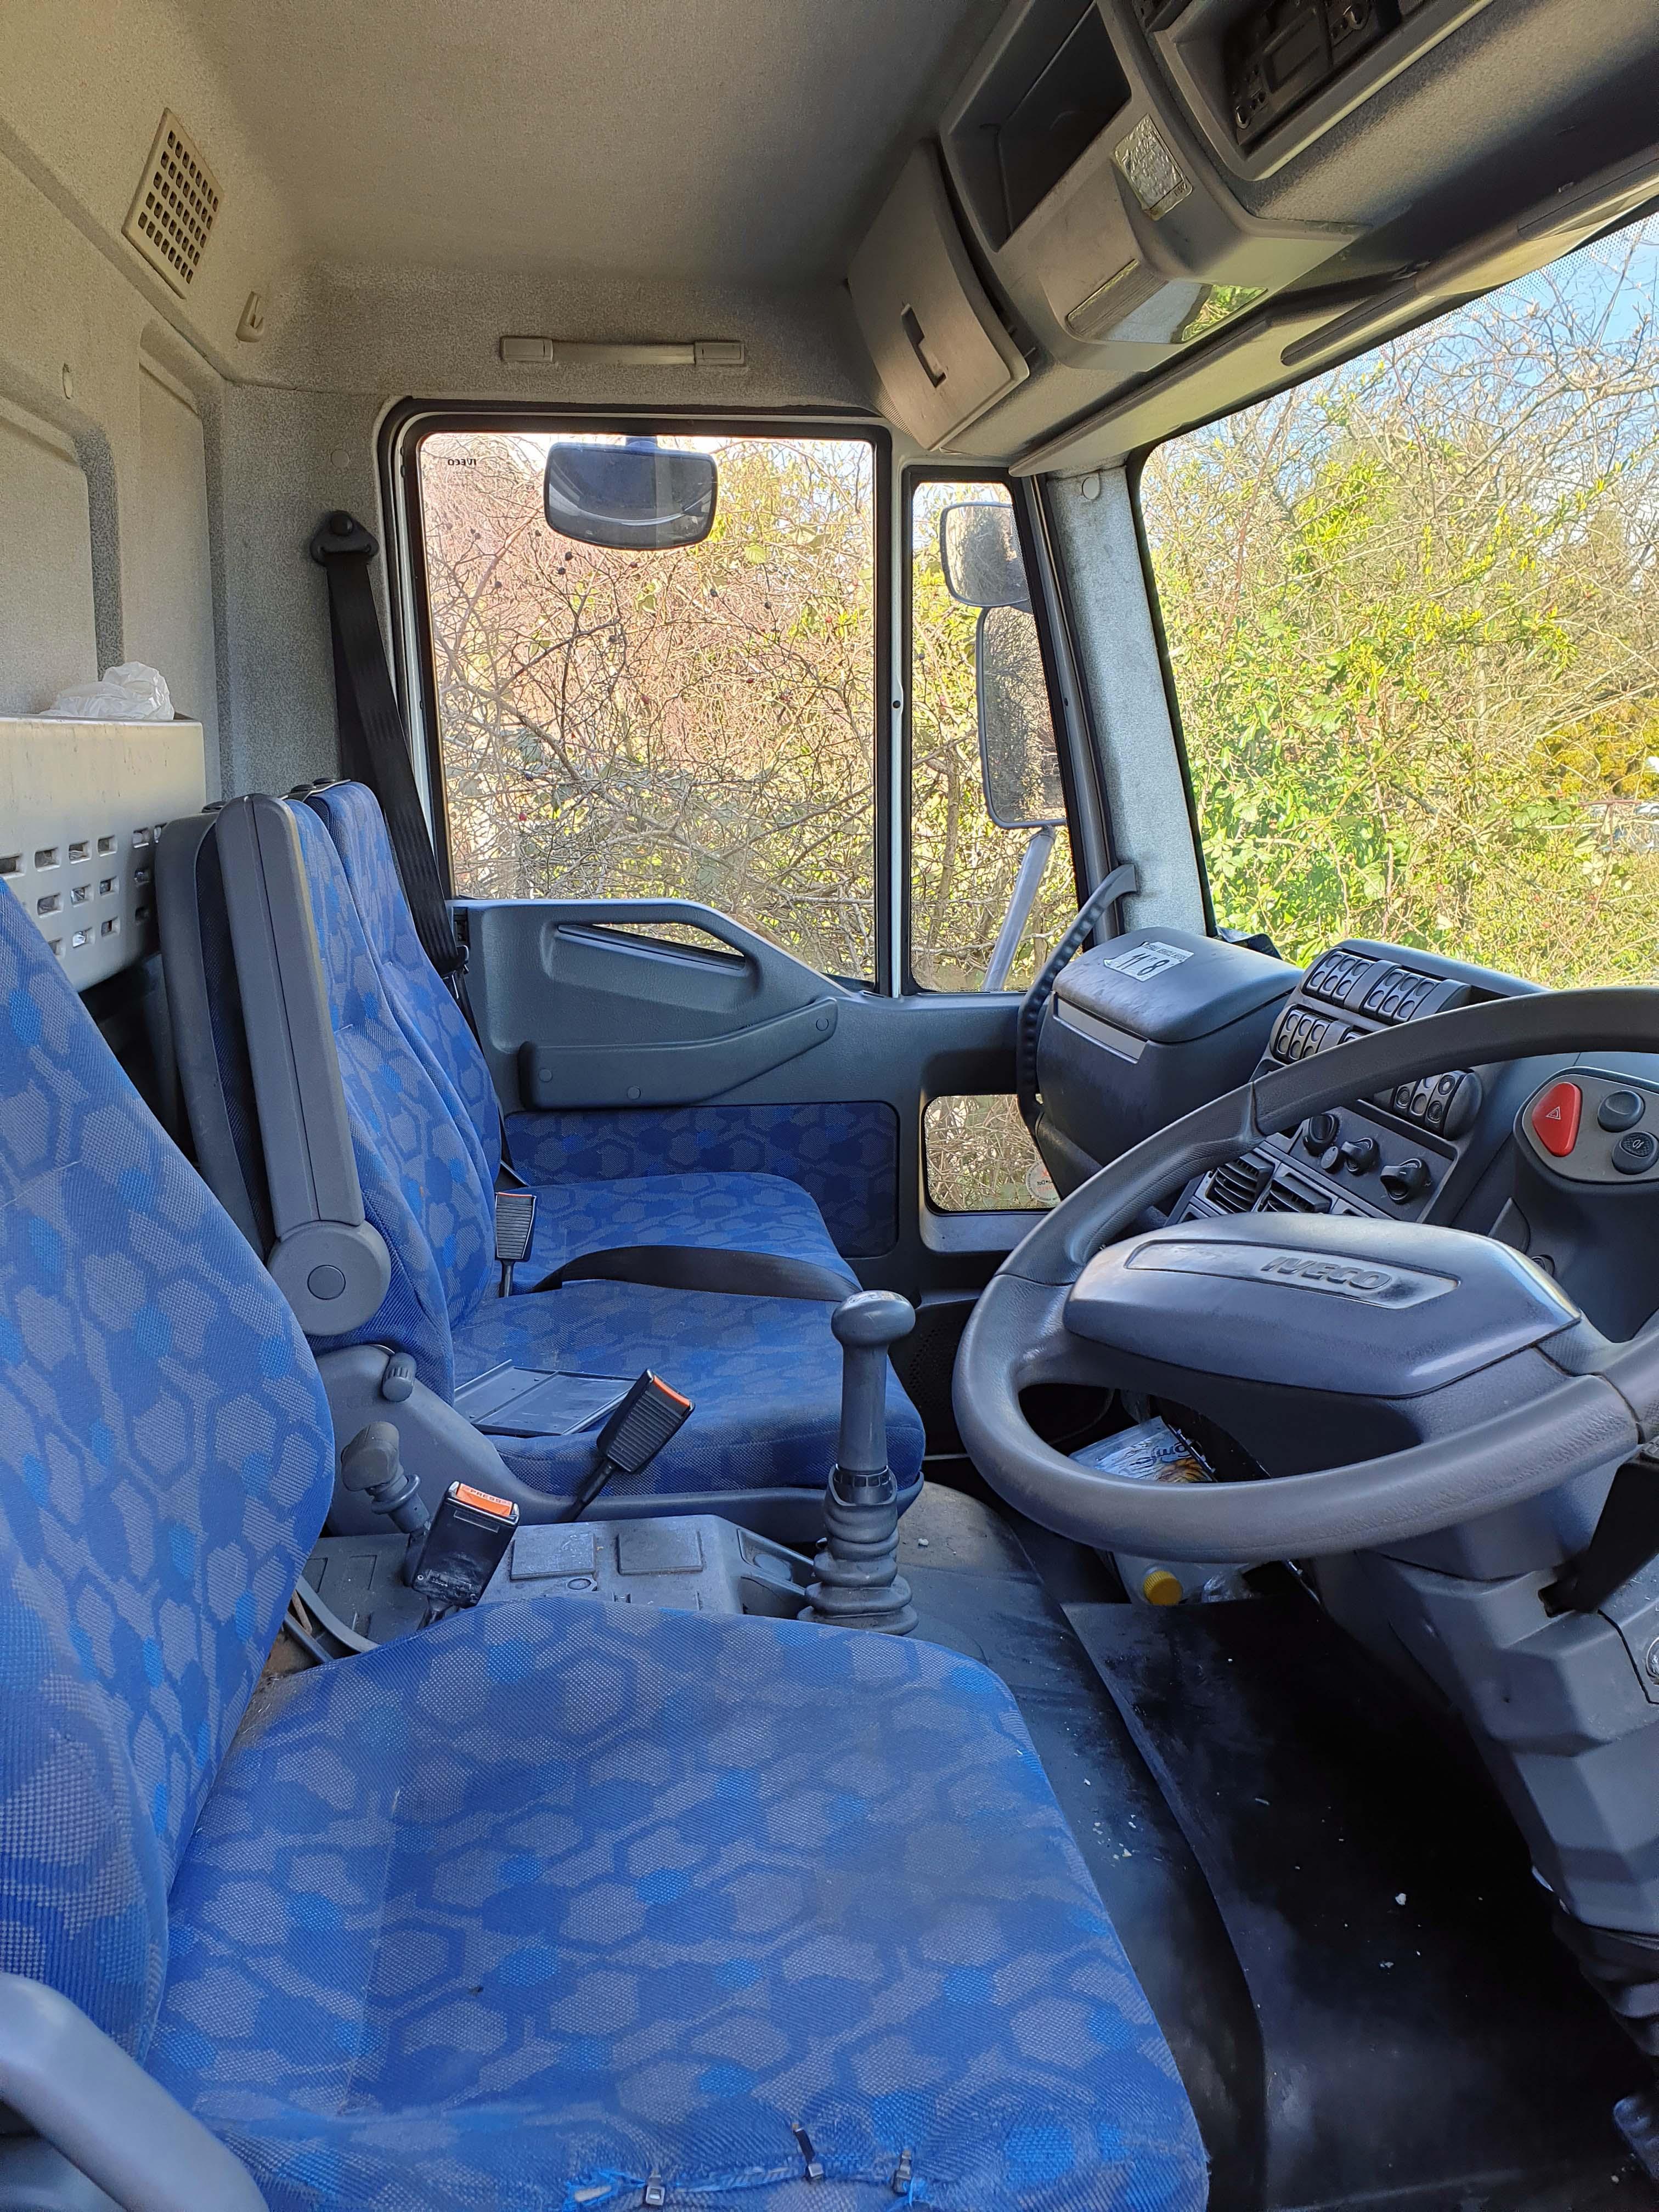 An IVECO Eurocargo ML 75 E17 3920cc 4x2 7.5-Tonne Curtainside Truck, Registration No. FJ55 KWG, - Image 5 of 5